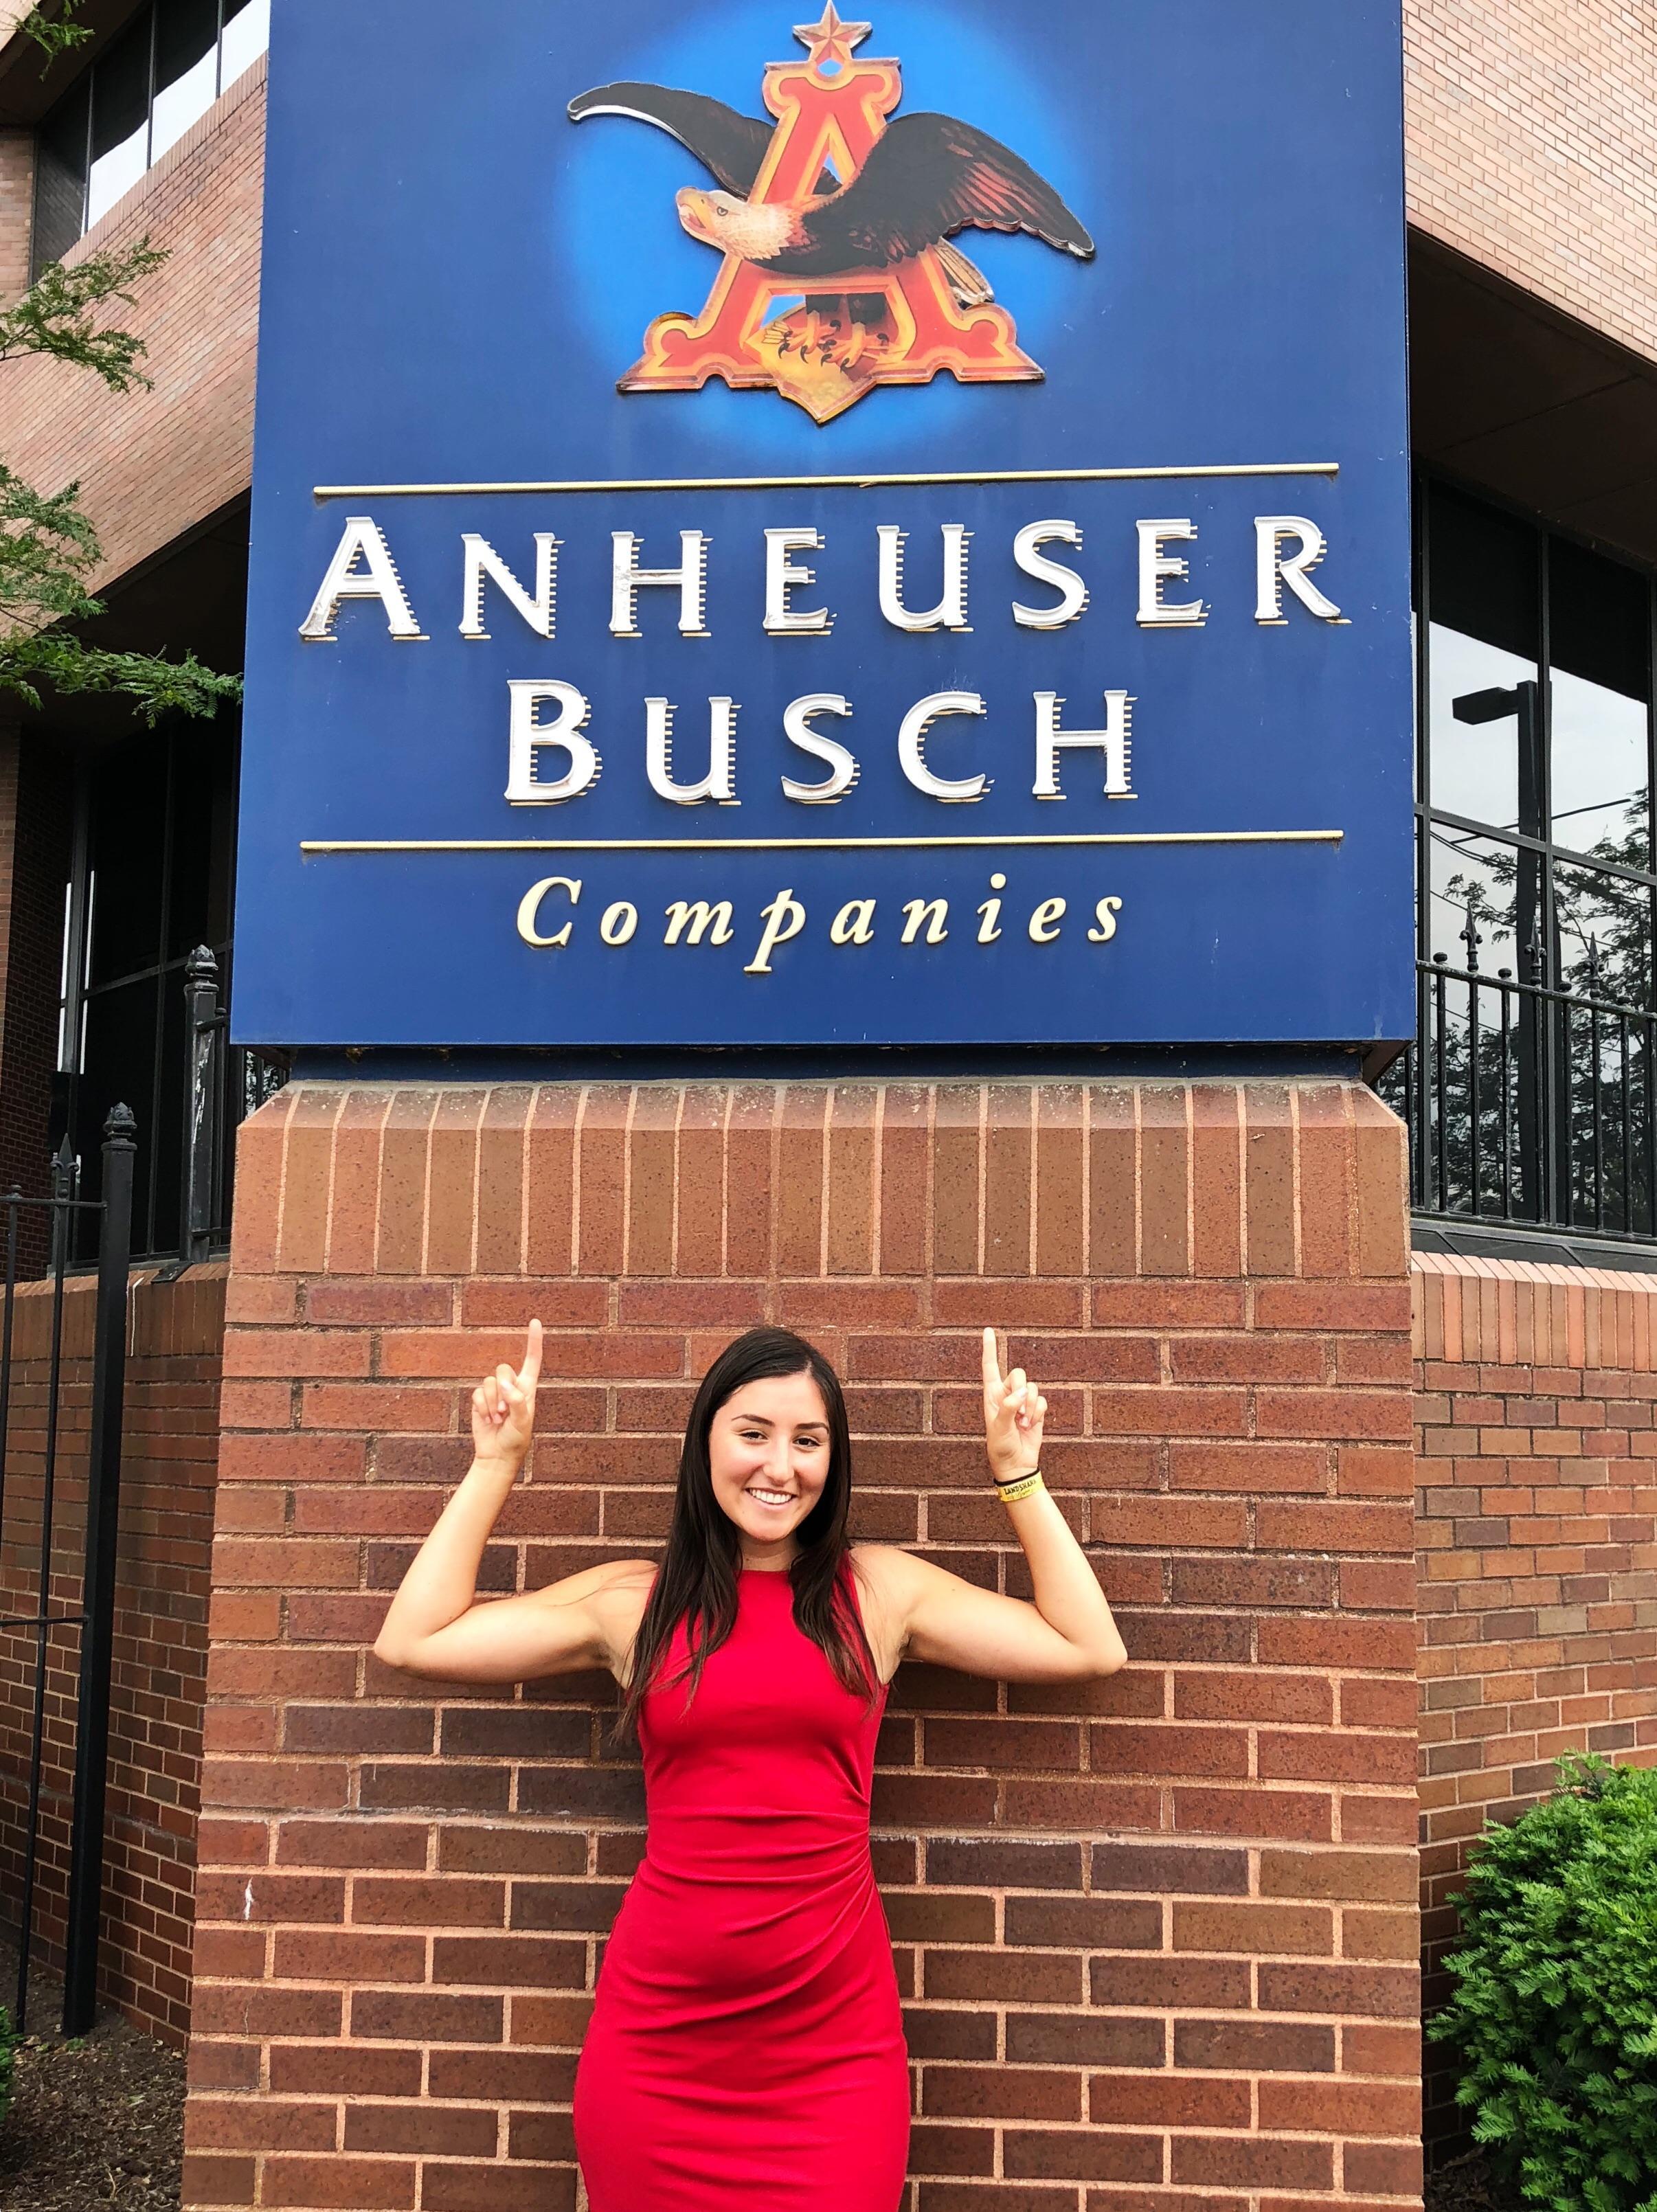 pointing at an Anheuser-Busch logo